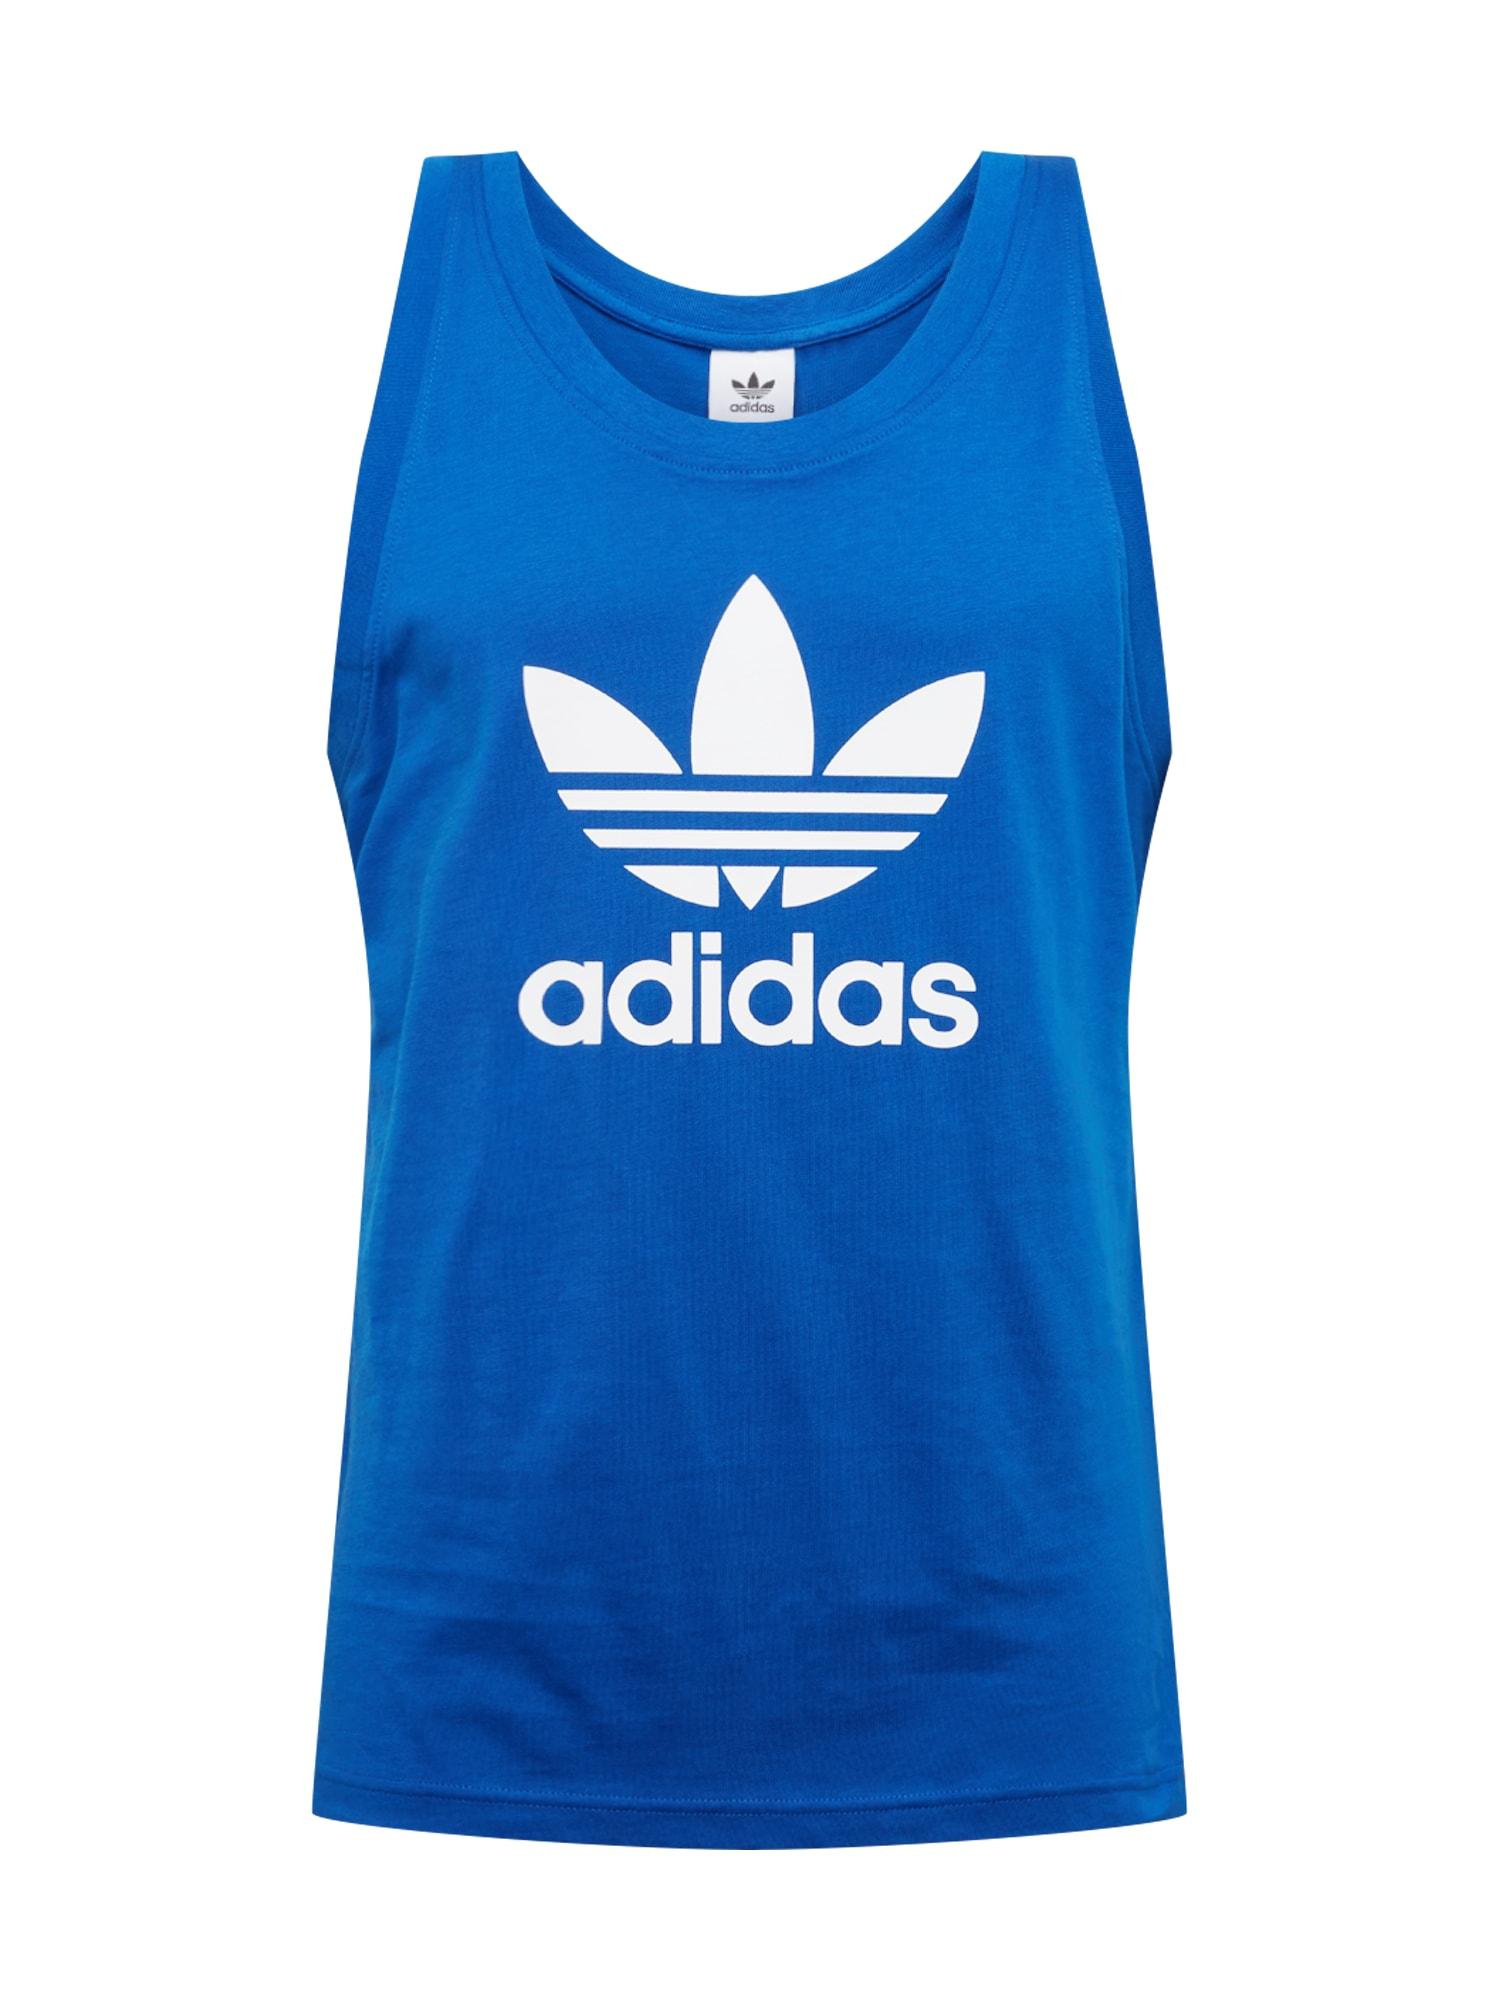 "ADIDAS ORIGINALS Marškinėliai 'TREFOIL' balta / sodri mėlyna (""karališka"")"